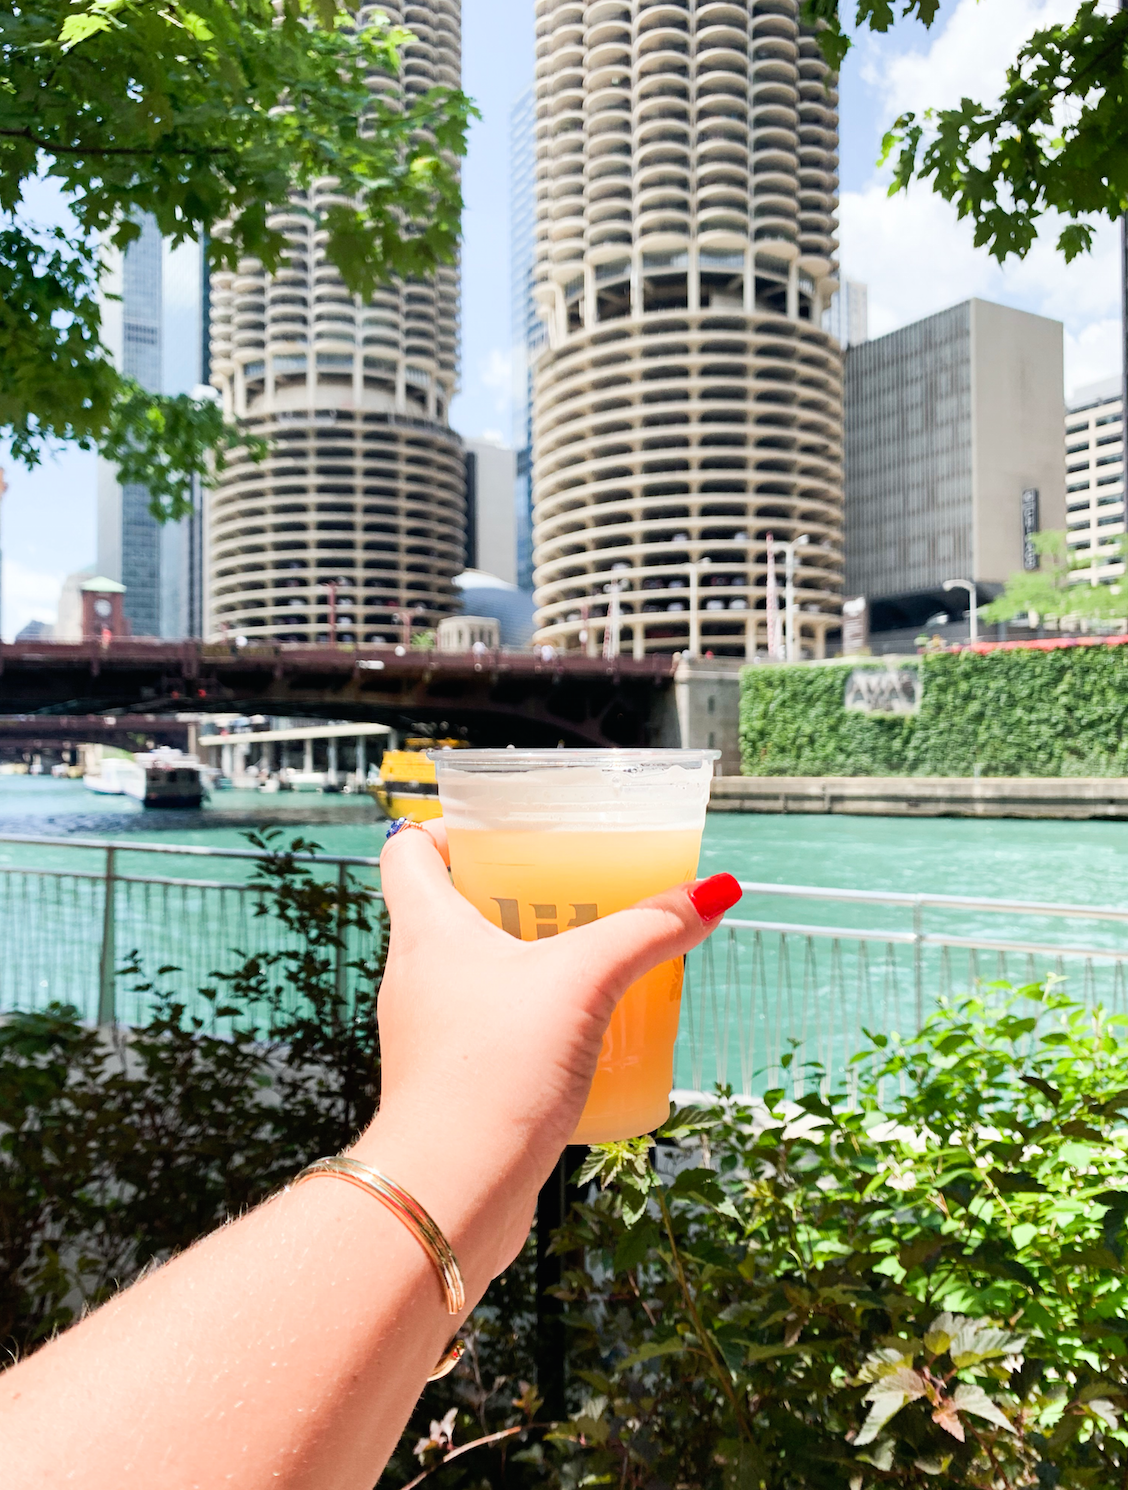 Chicago Brewery on the Riverwalk